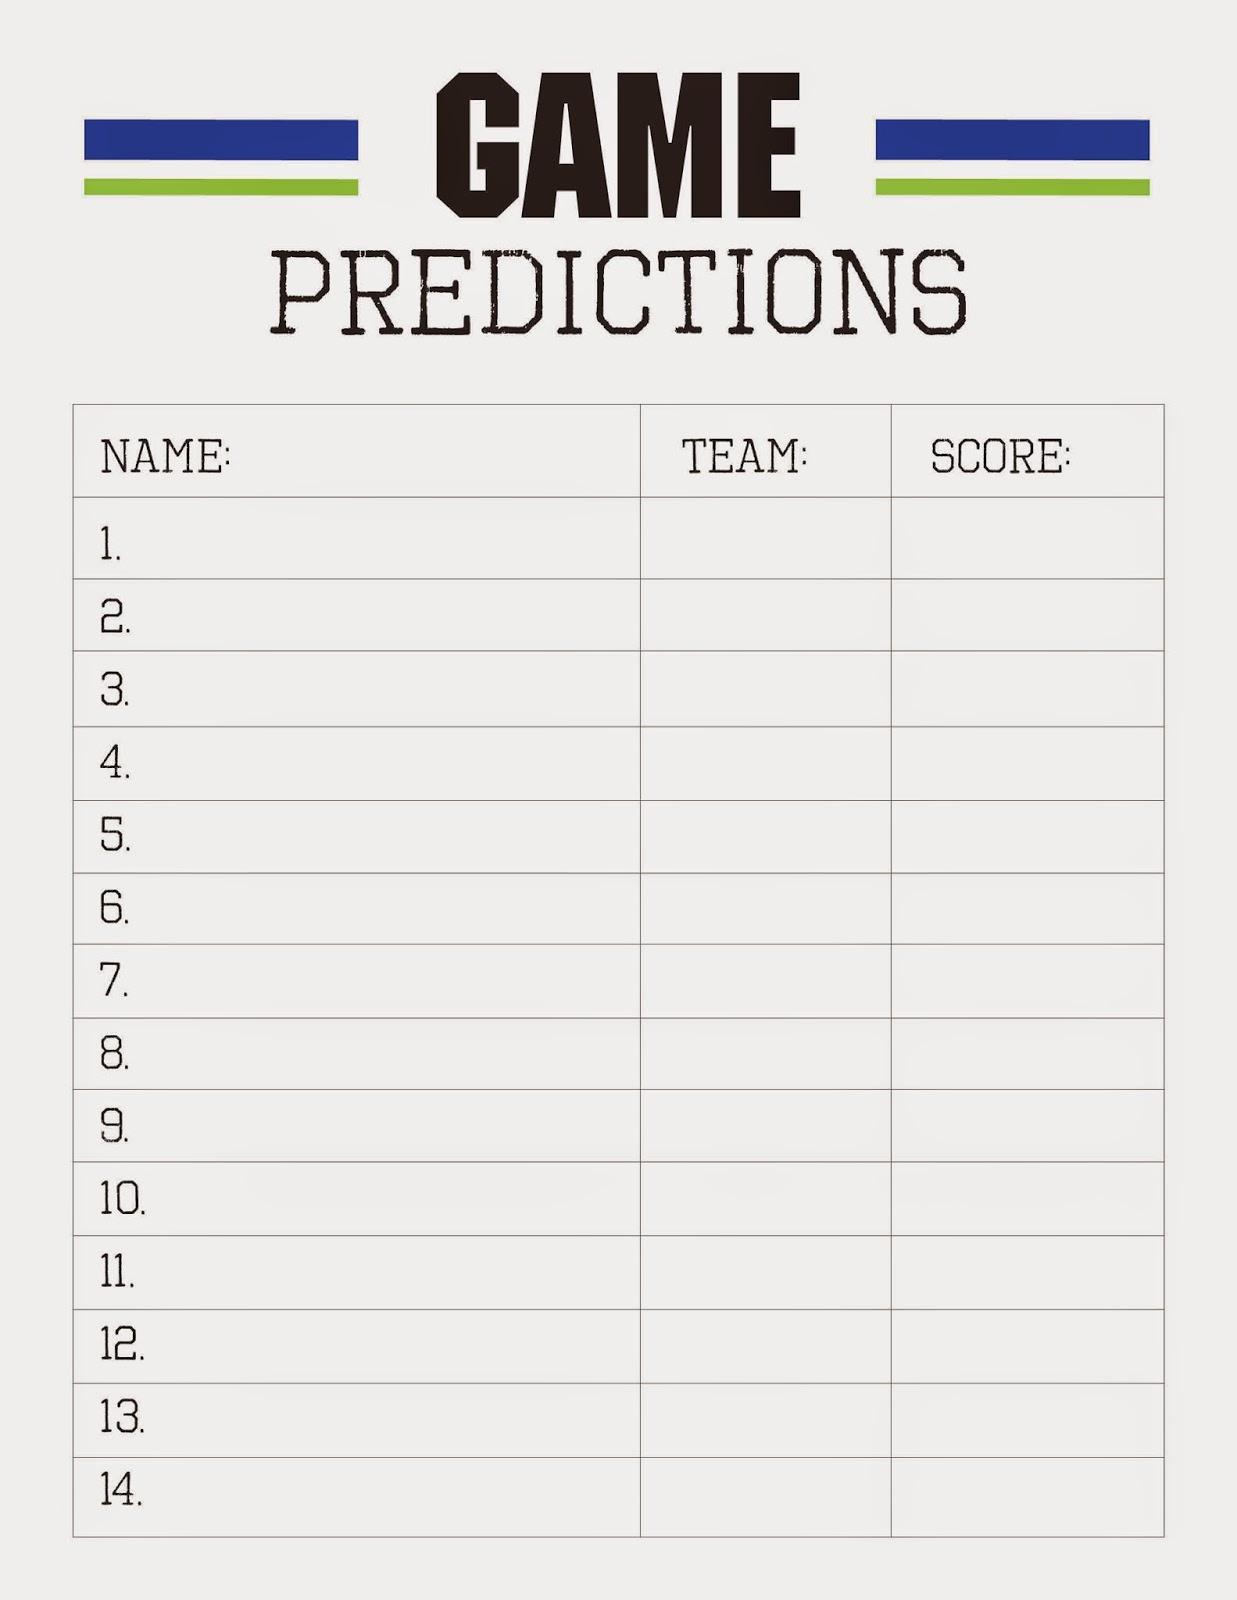 Bowl Game Predictions >> Freebies: Super Bowl Party Printables - Designs by TiffanyCo